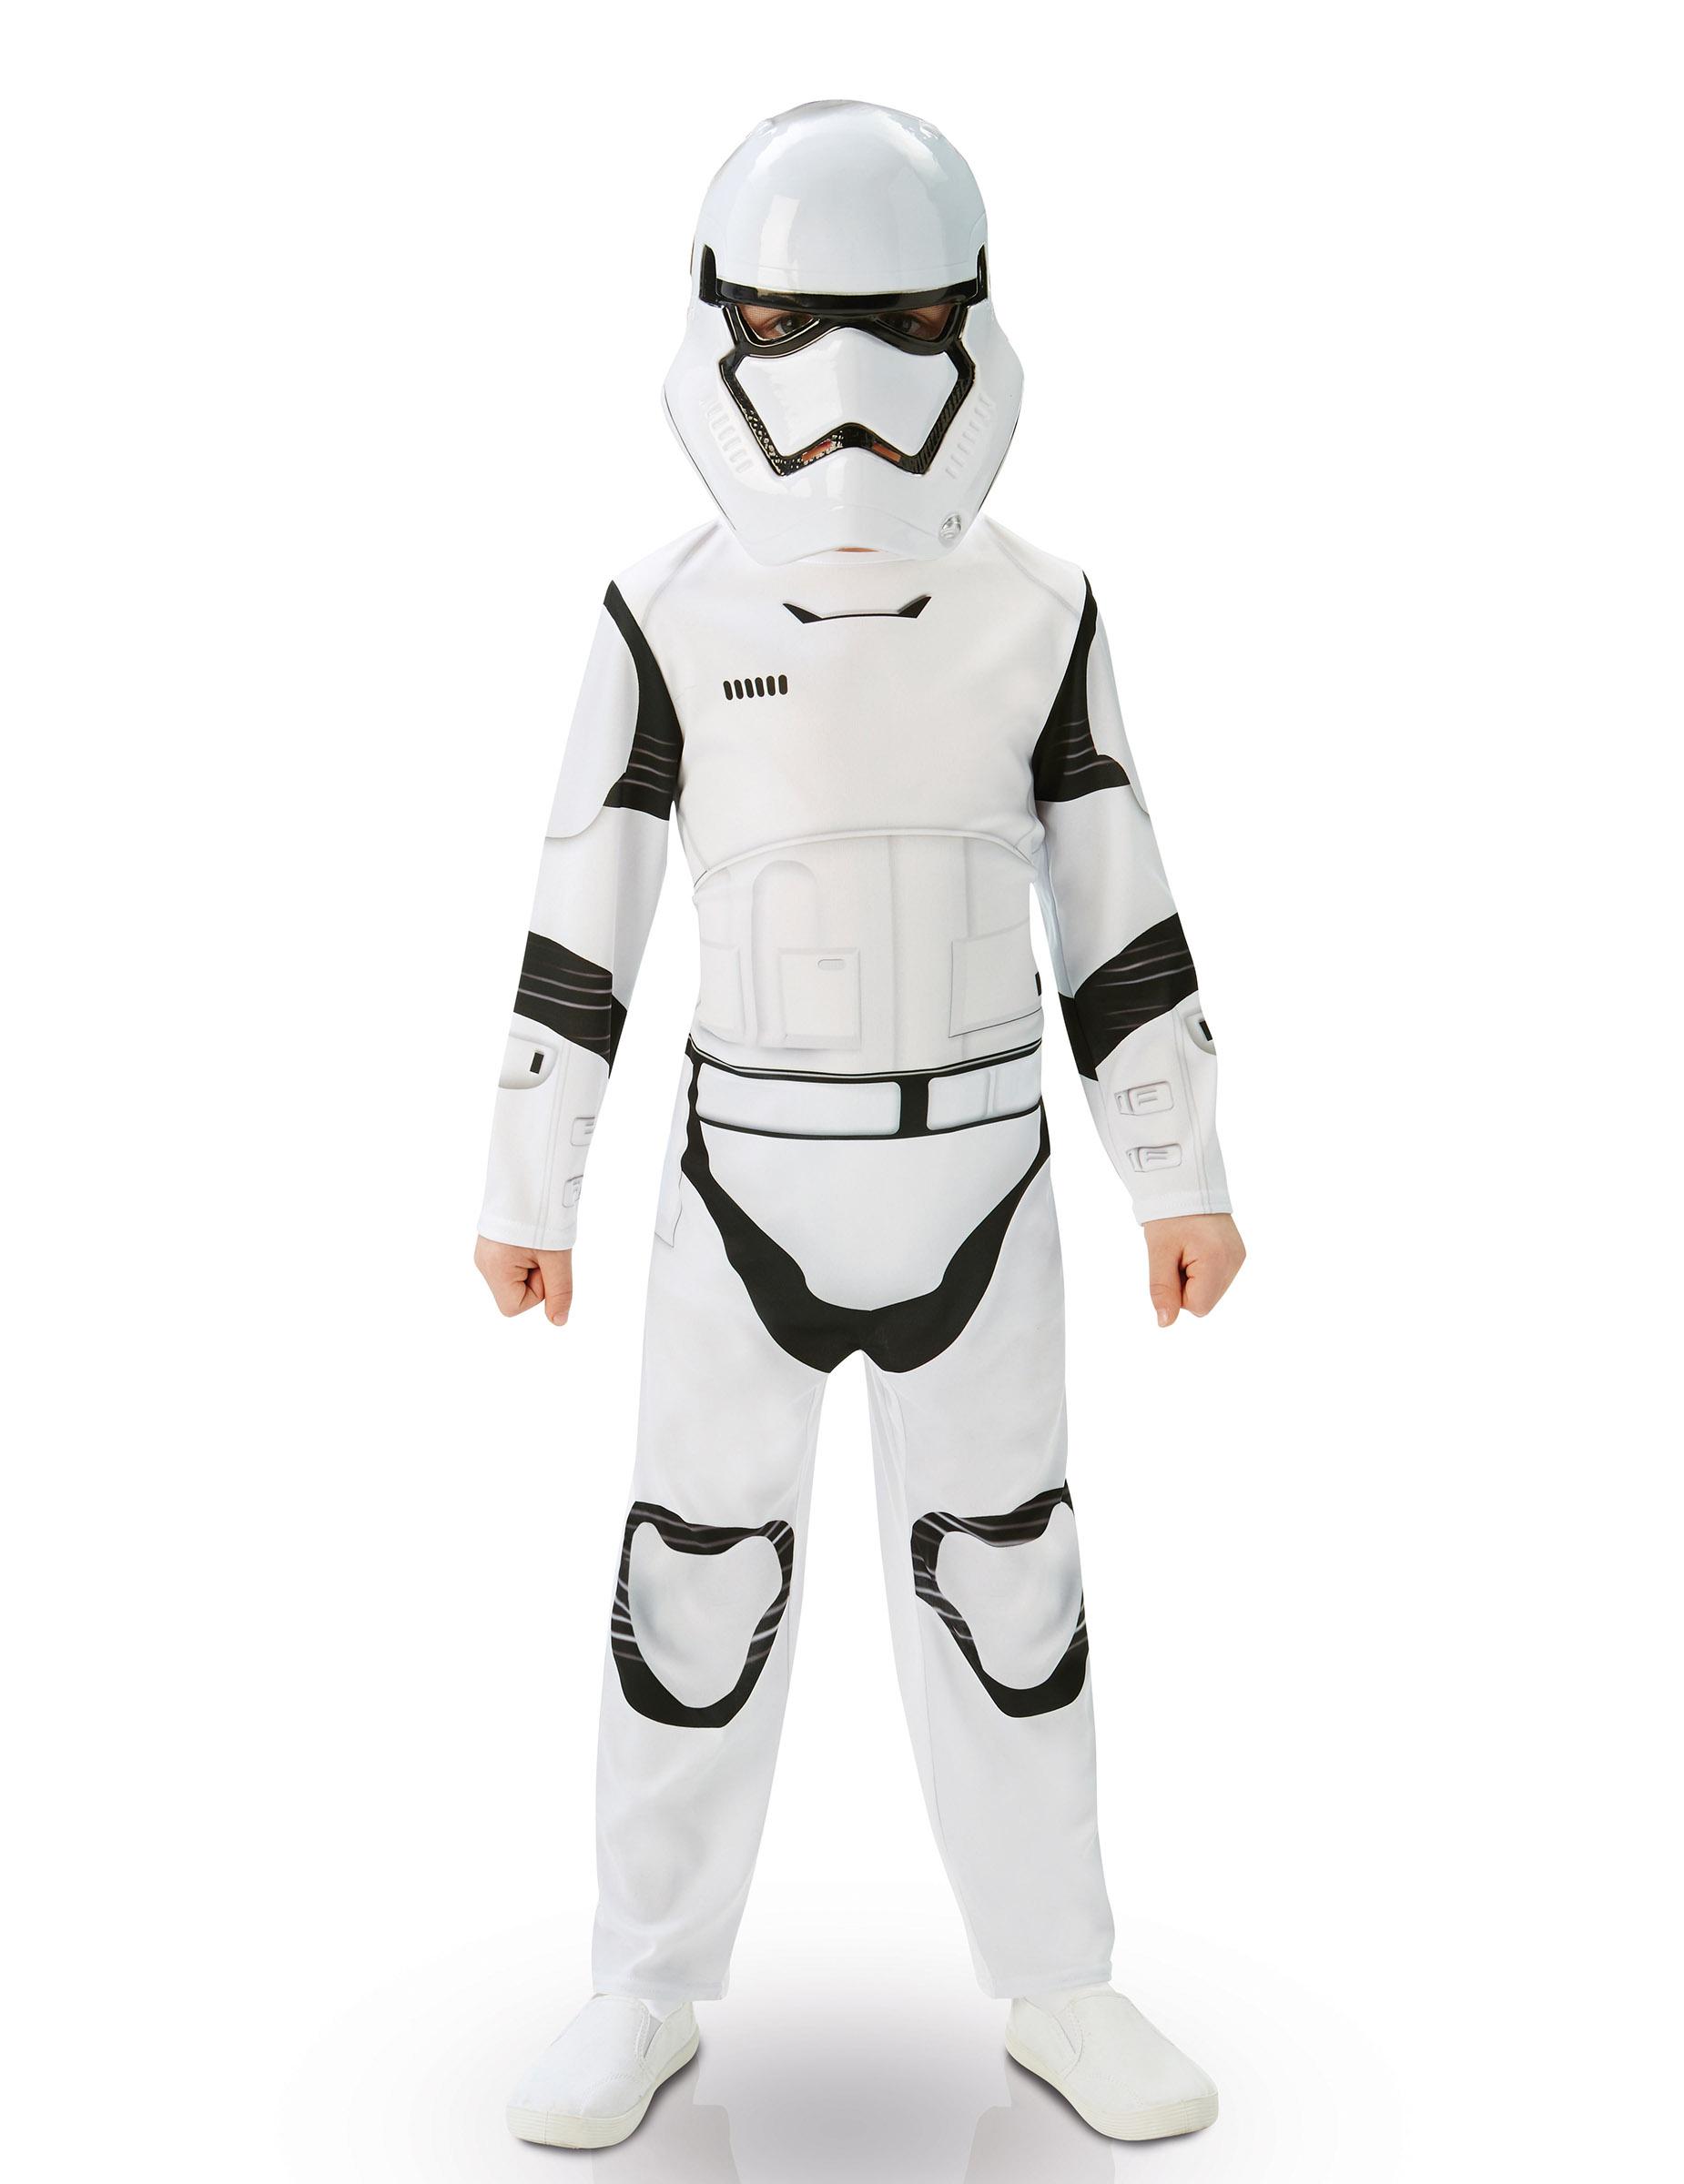 deguisement-classique-stormtrooper-star-wars-vii_231345